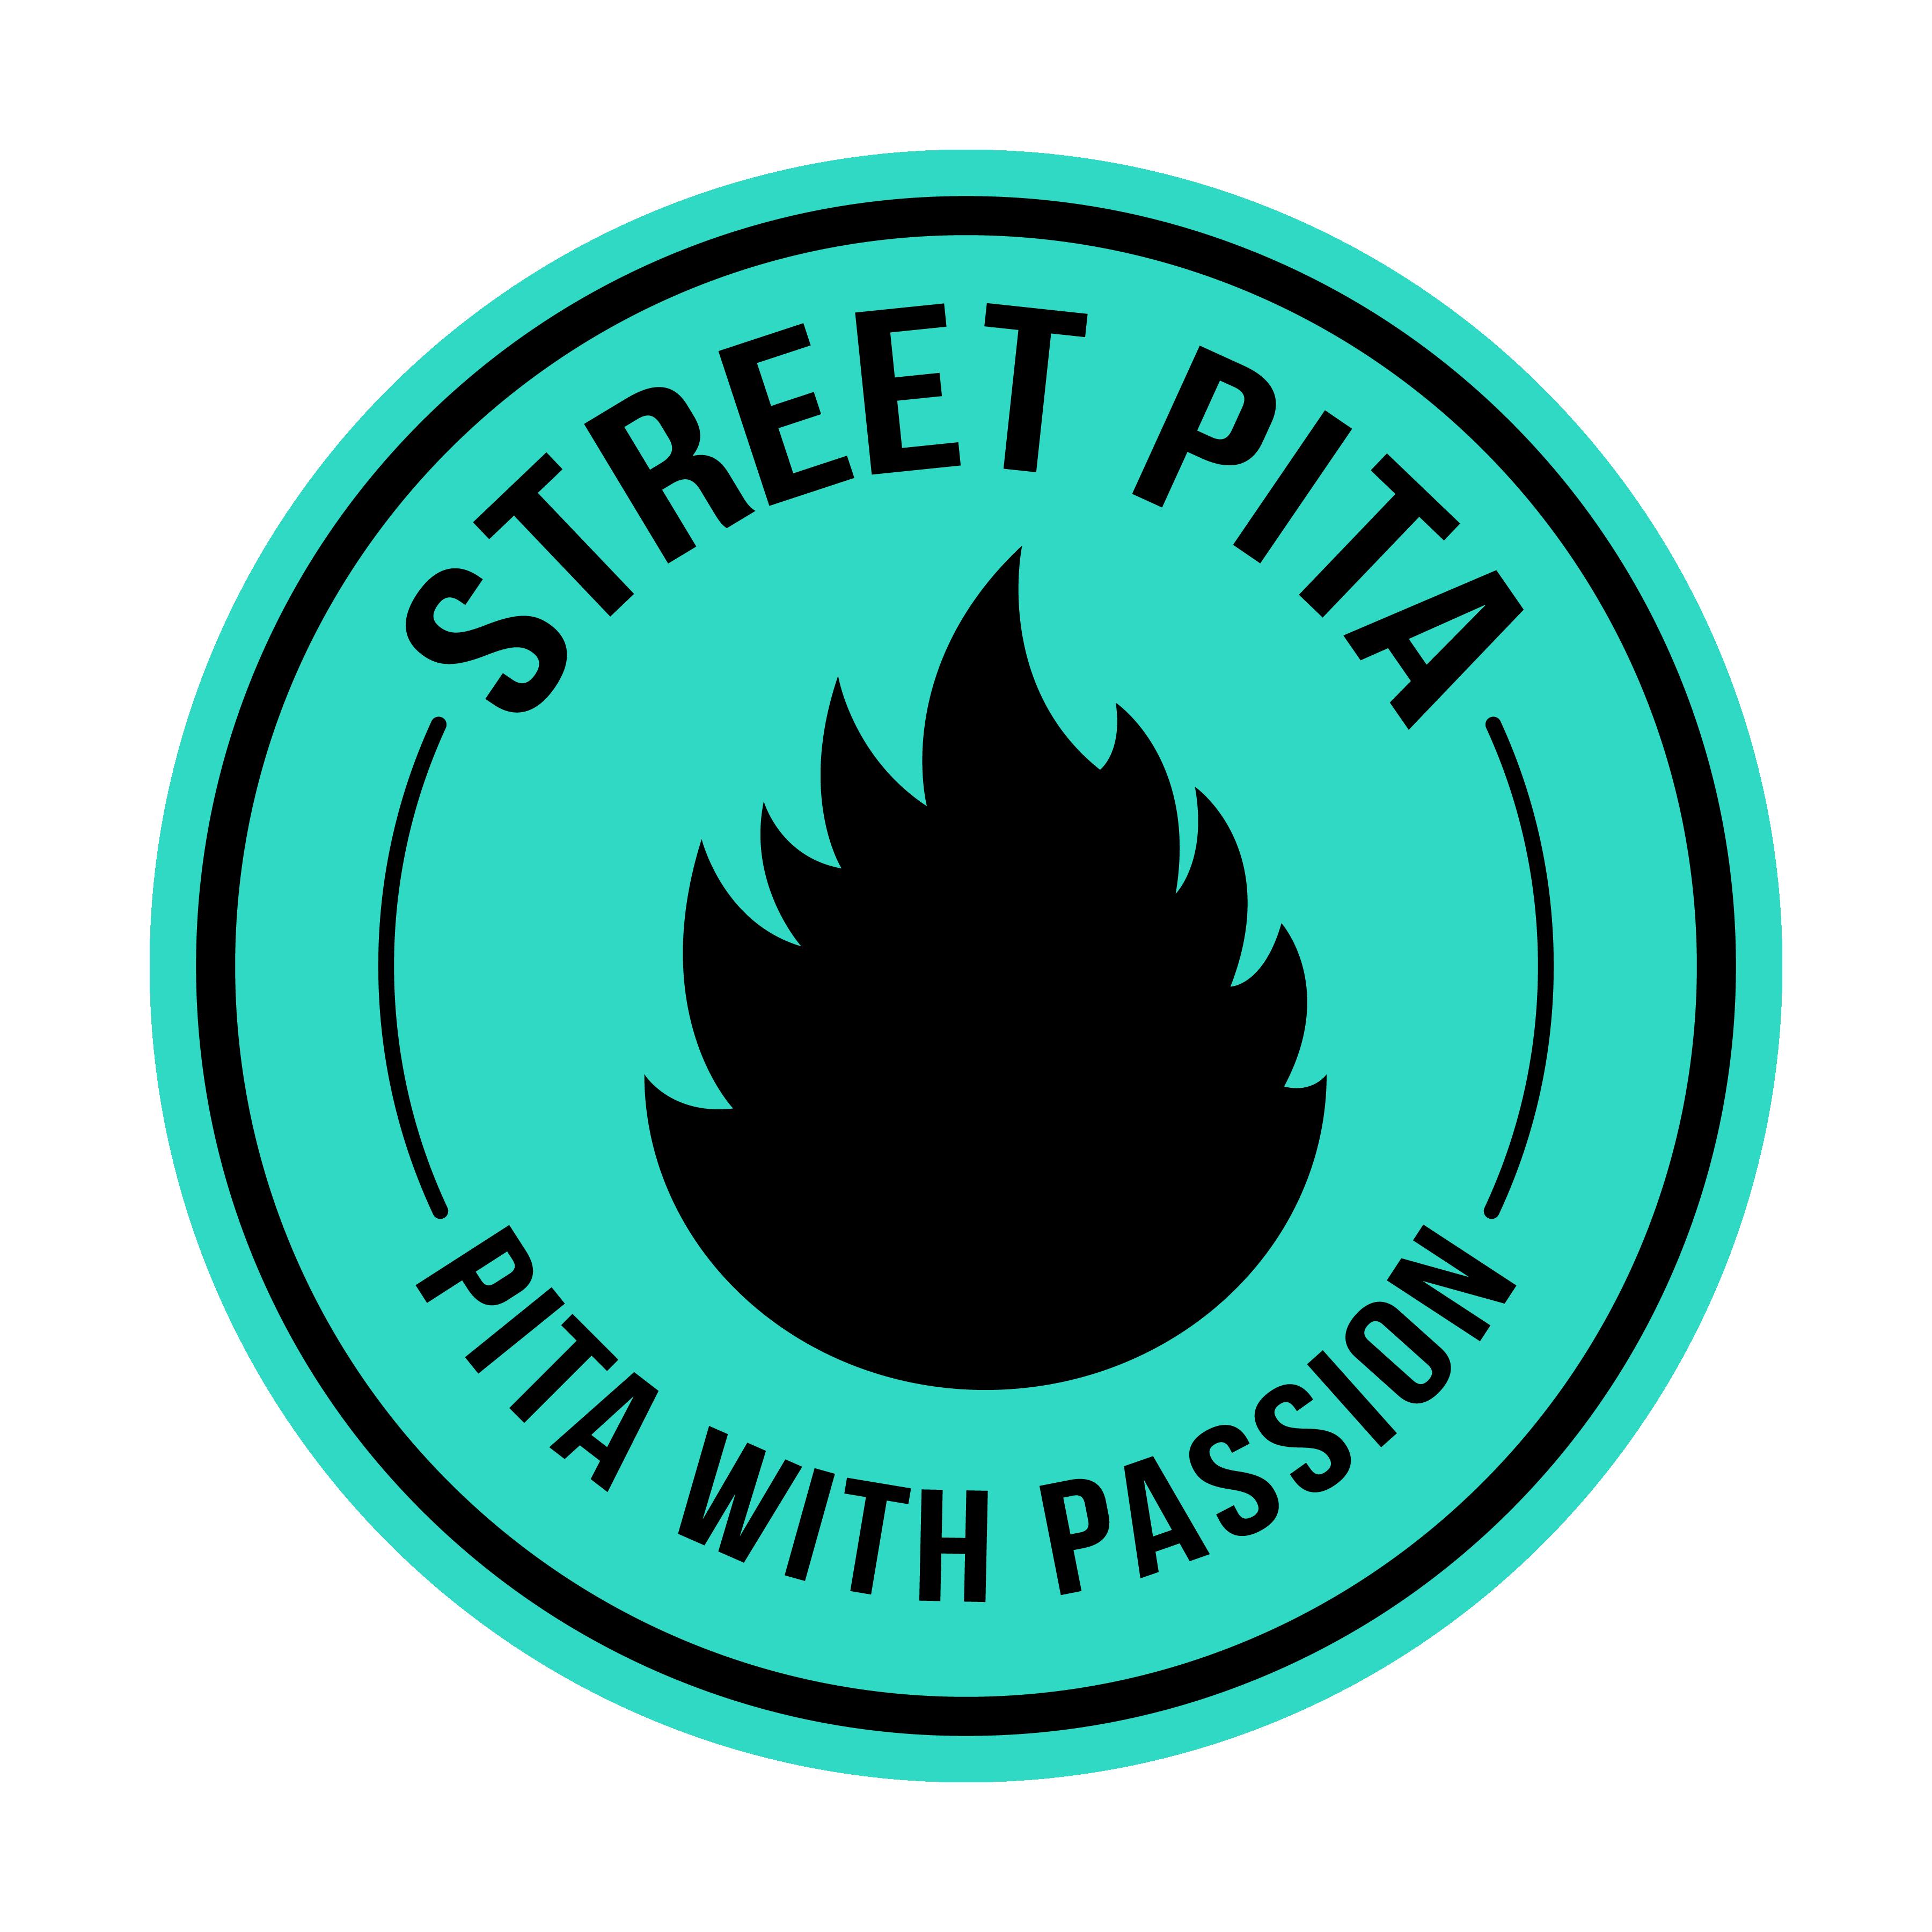 Street Pita – Pita with passion